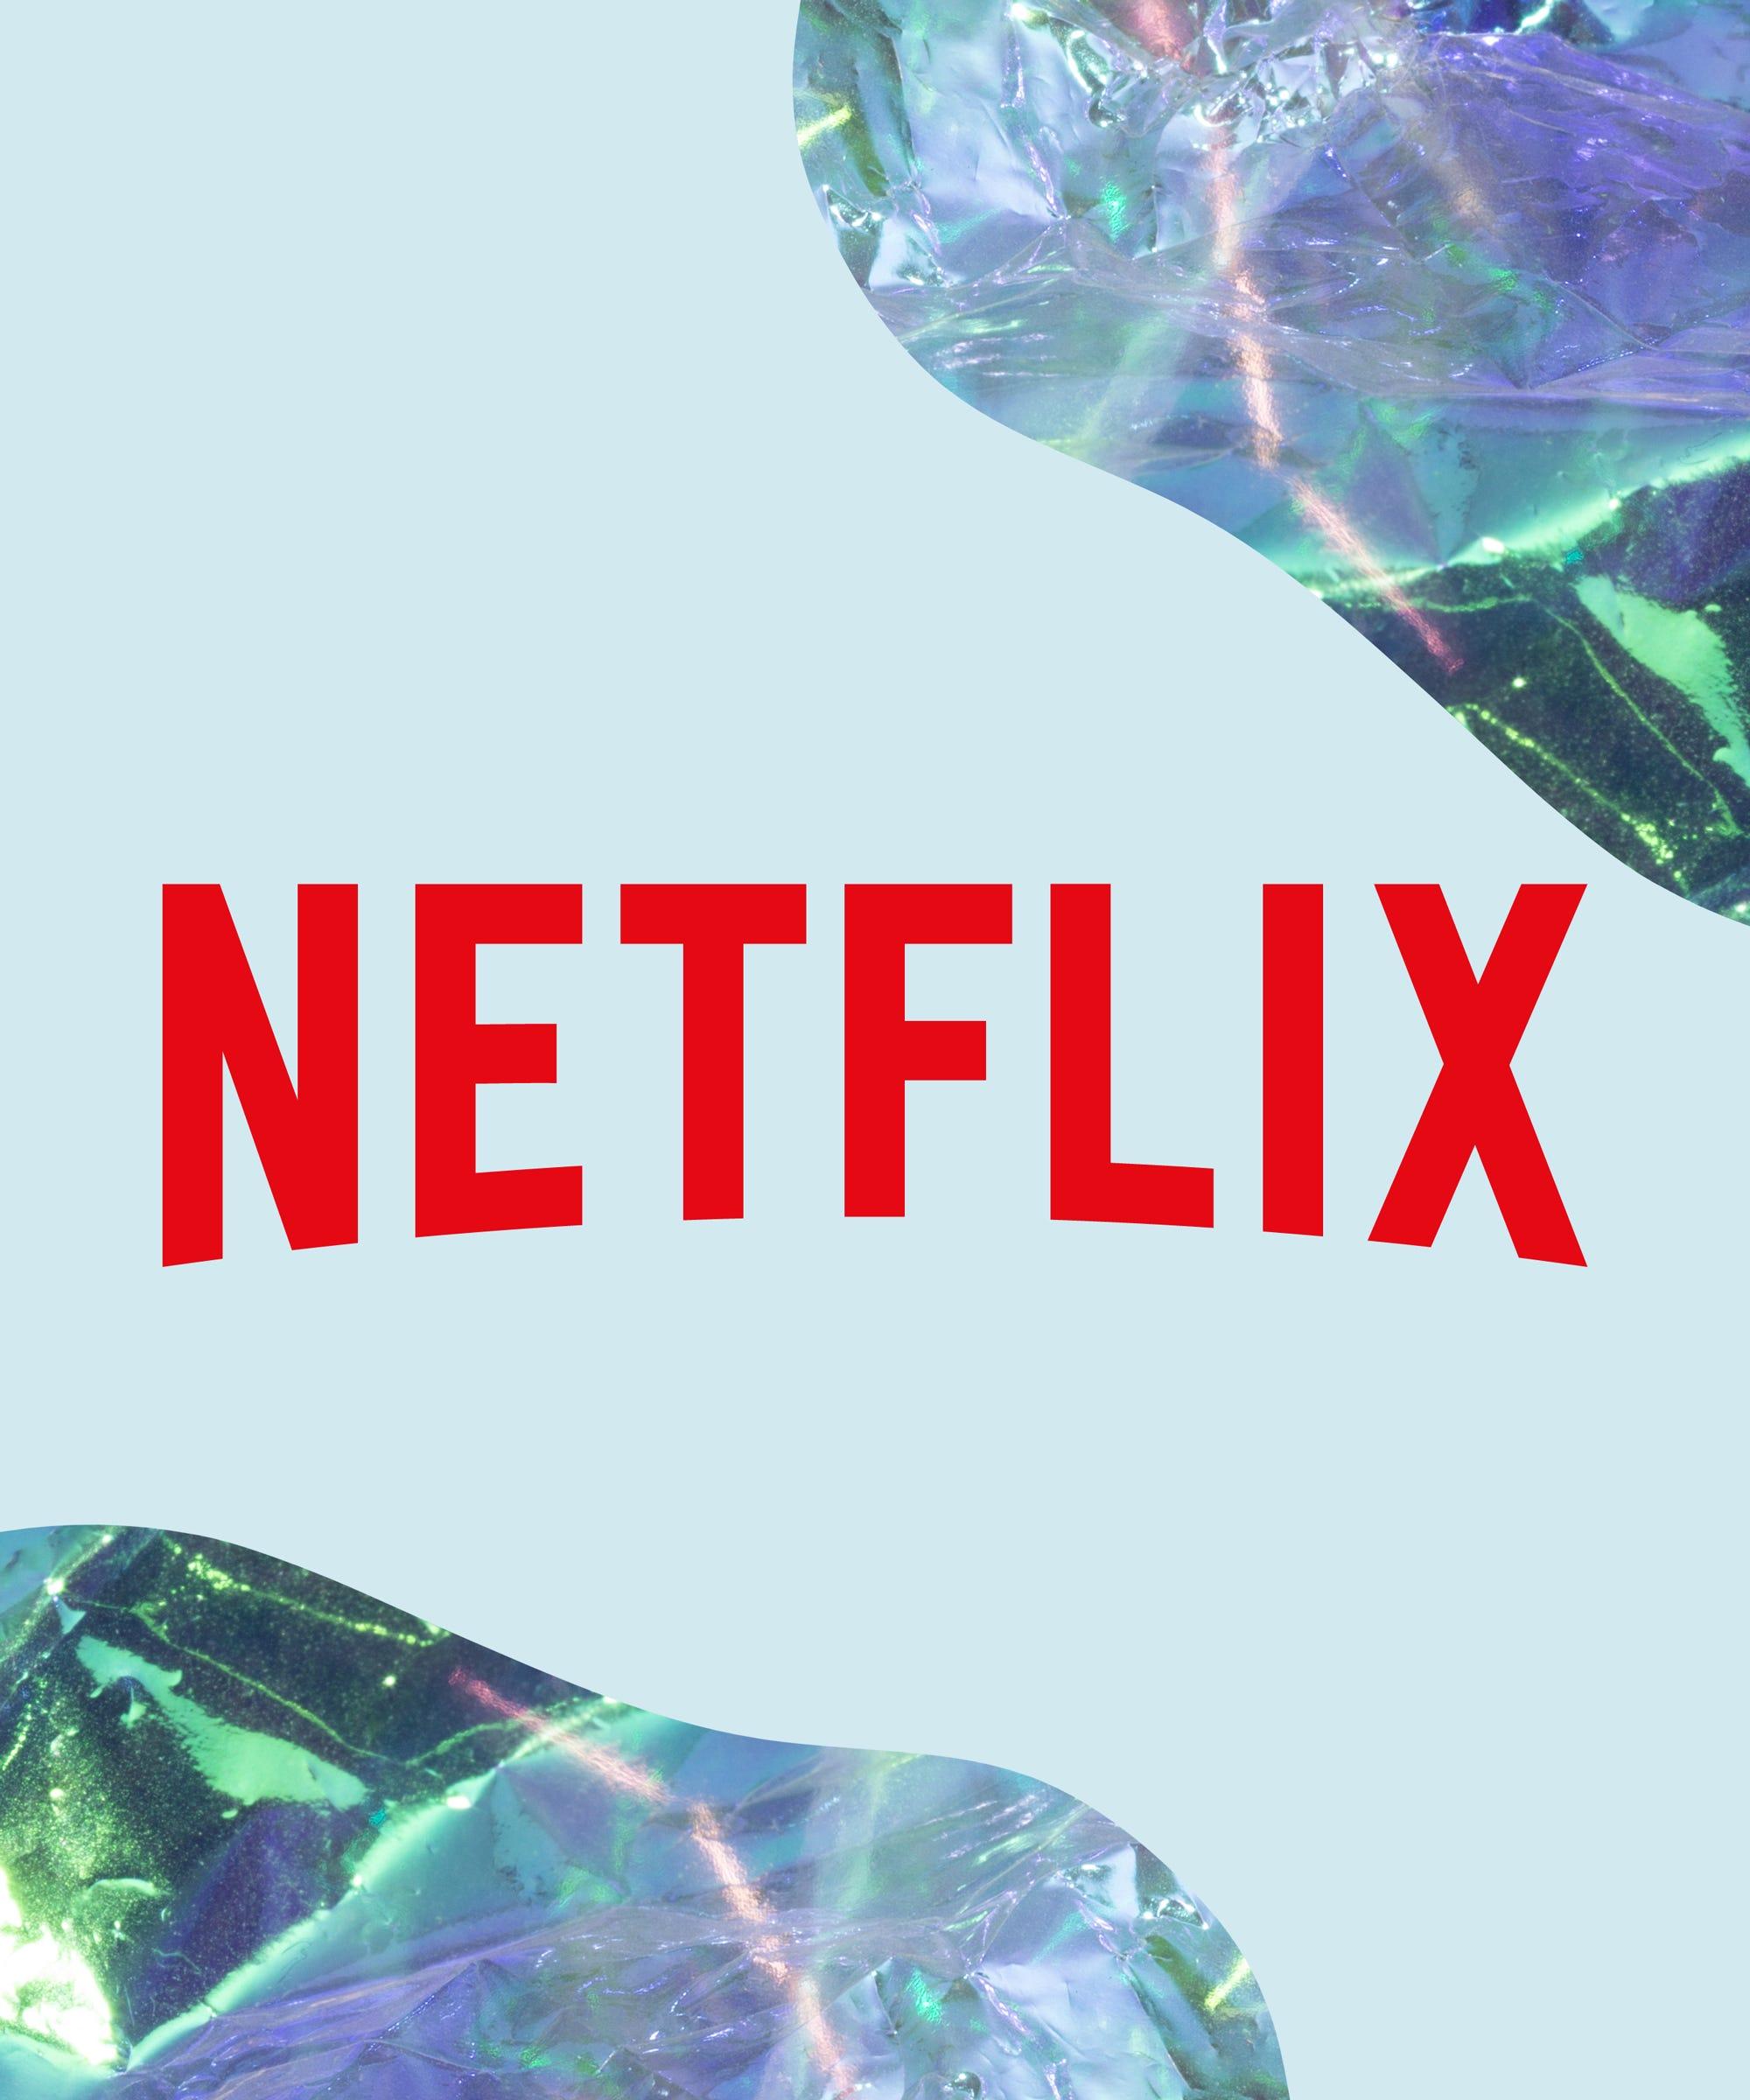 Netflix Designs New Original Typeface Netflix Sans